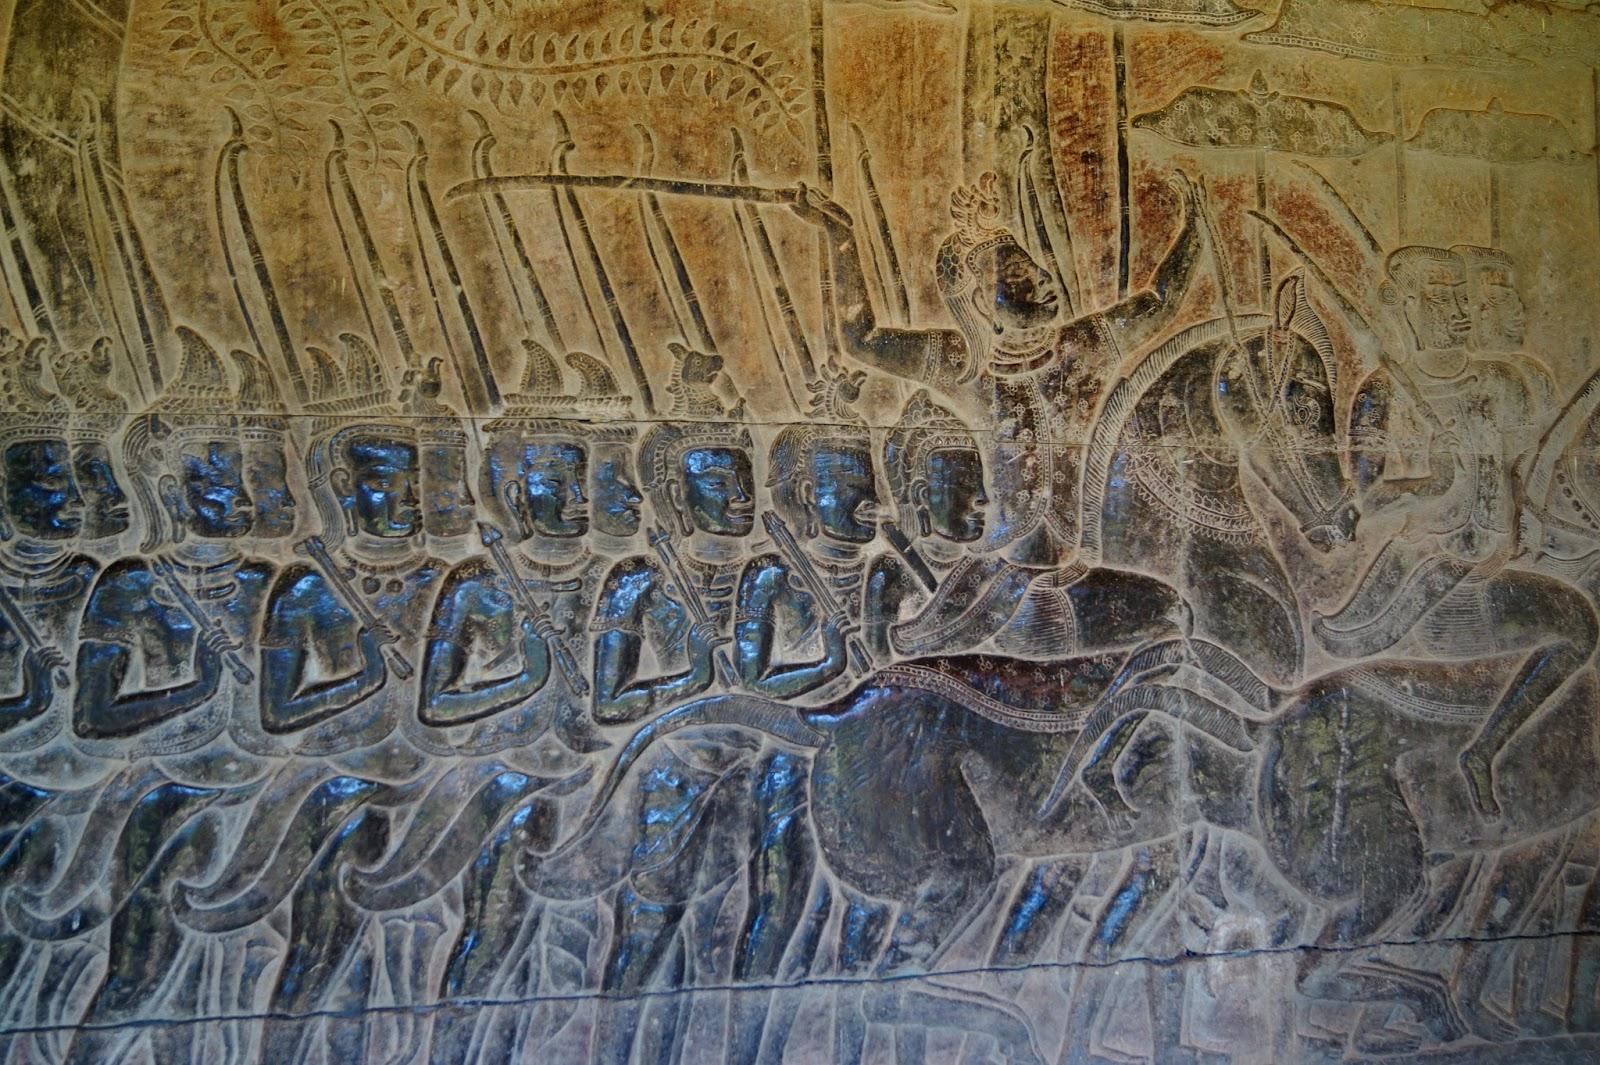 les t sur terre temples d 39 angkor aangkor wat merveilles du monde 8 d c. Black Bedroom Furniture Sets. Home Design Ideas